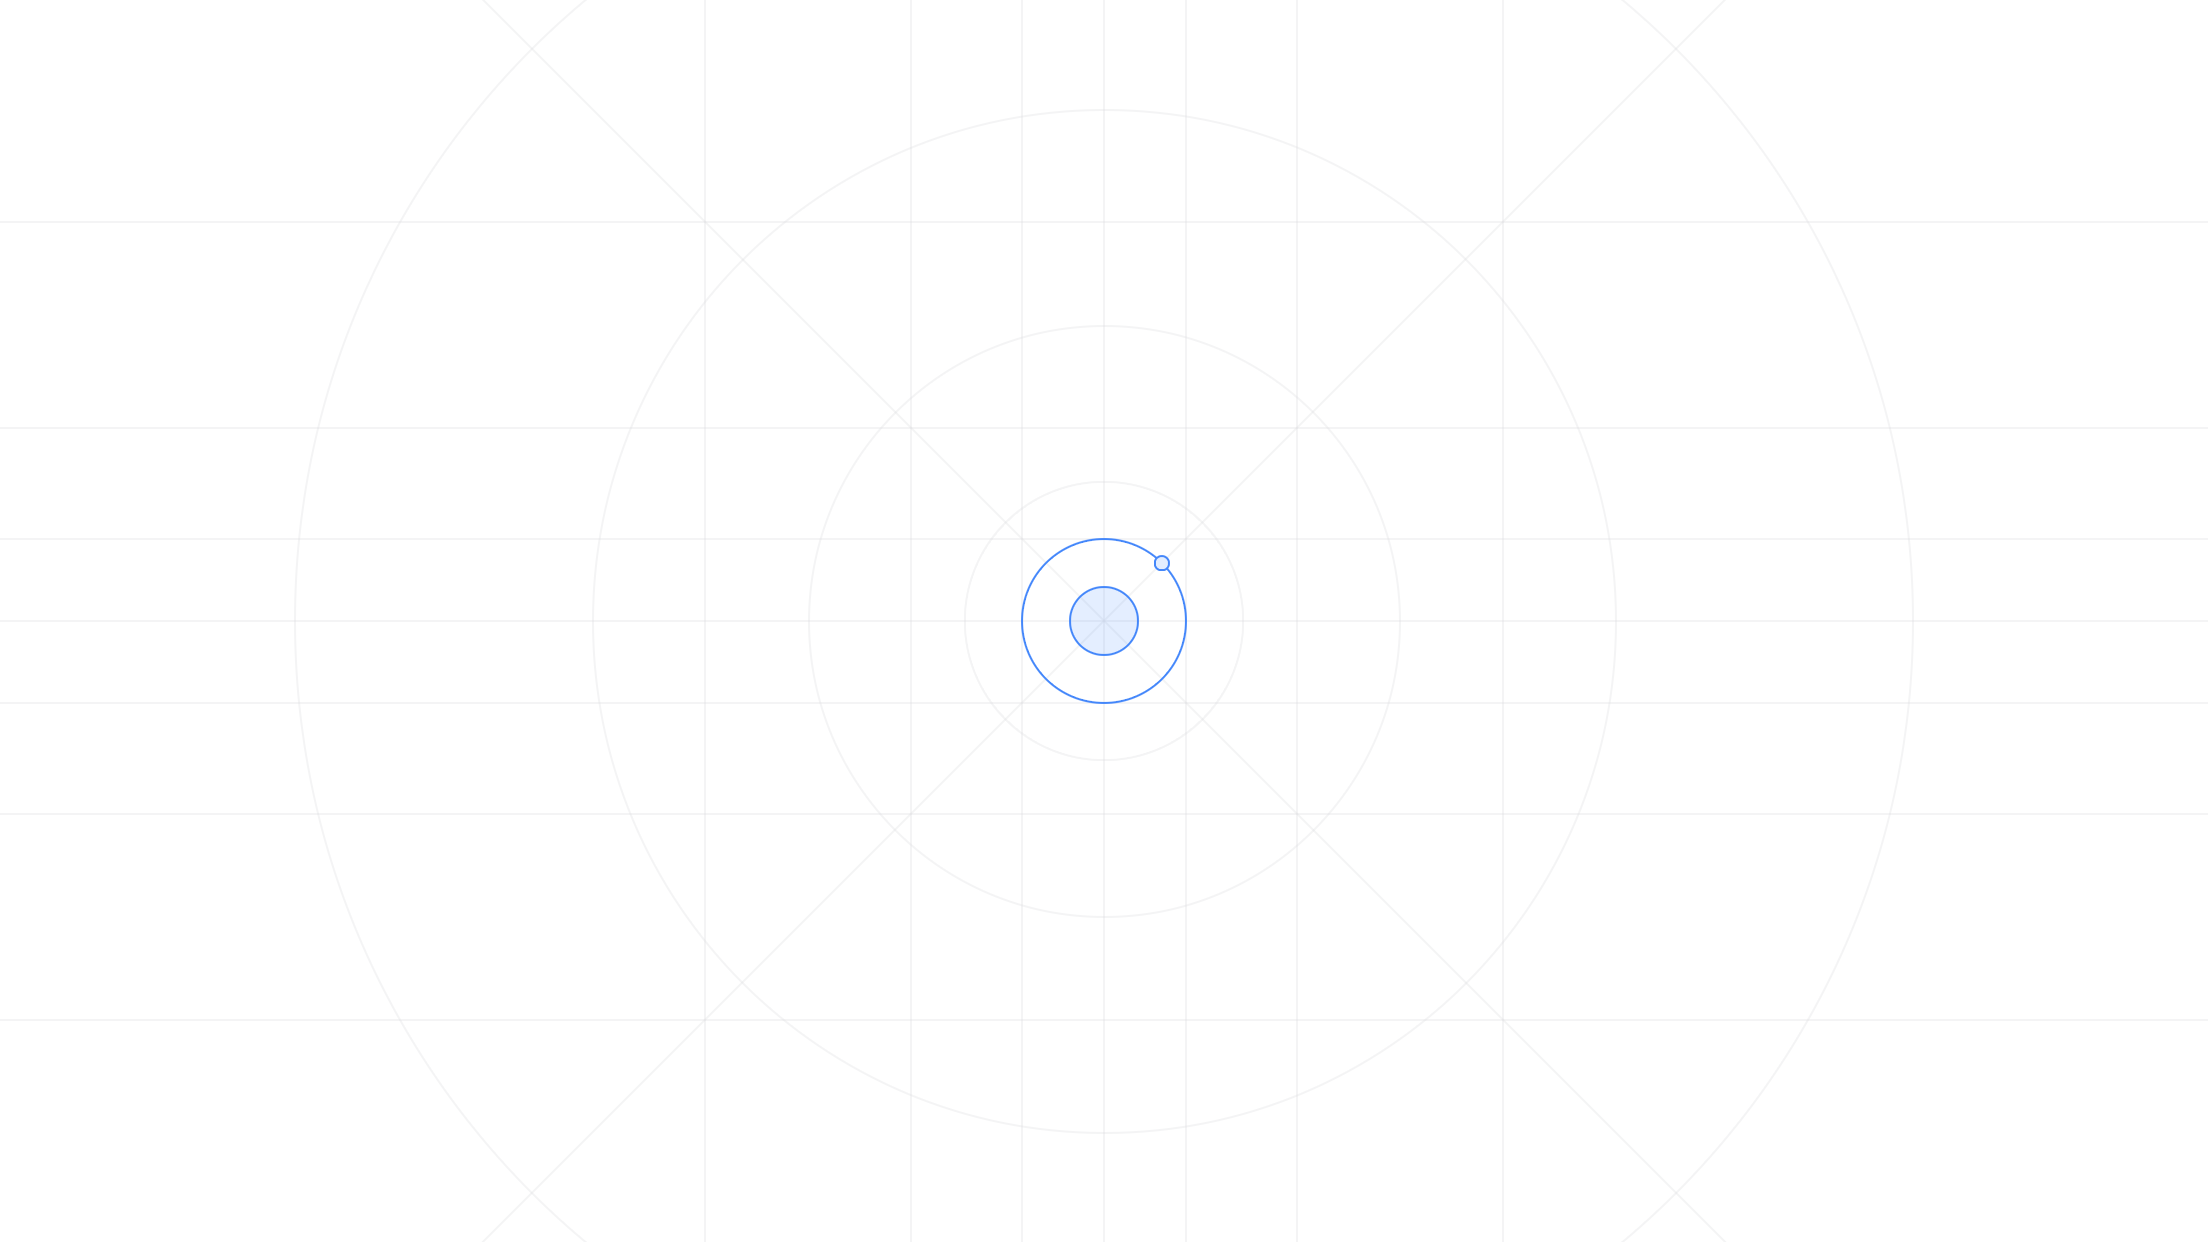 klu5/resources/ios/splash/Default-Landscape-736h.png